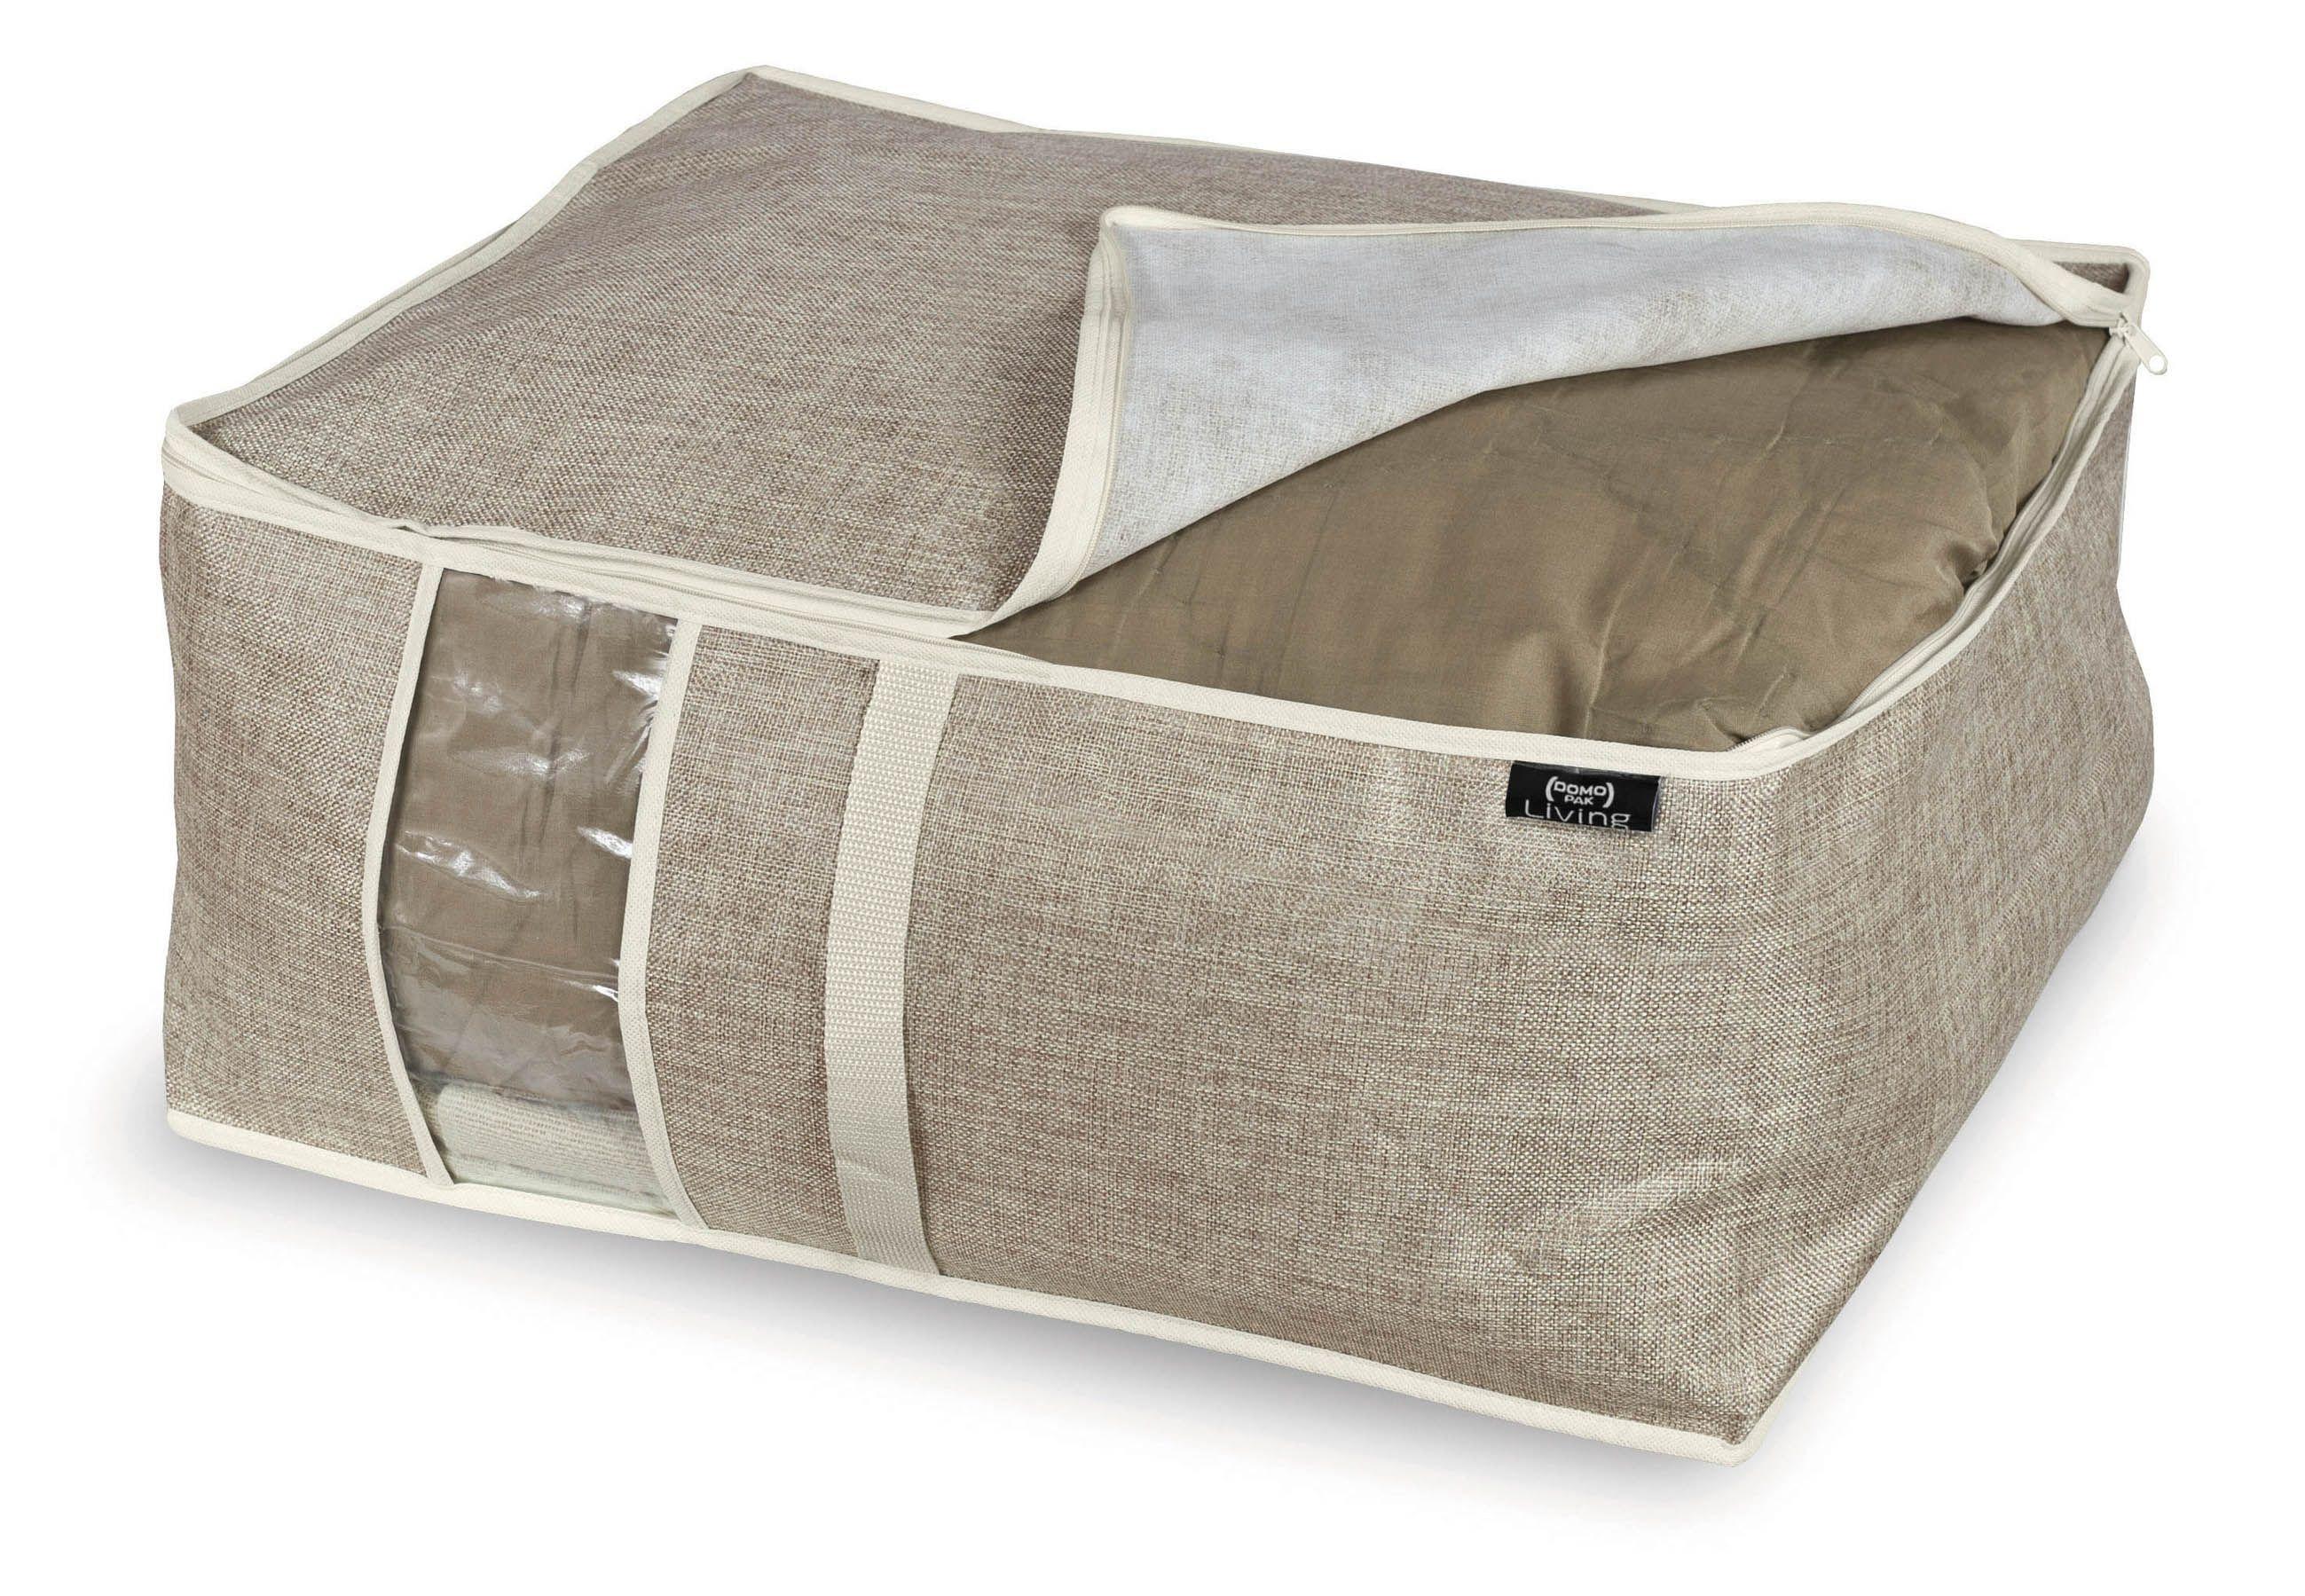 Organizator textil pliabil cu fermoar, Maison Crem, L55xl45xH25 cm